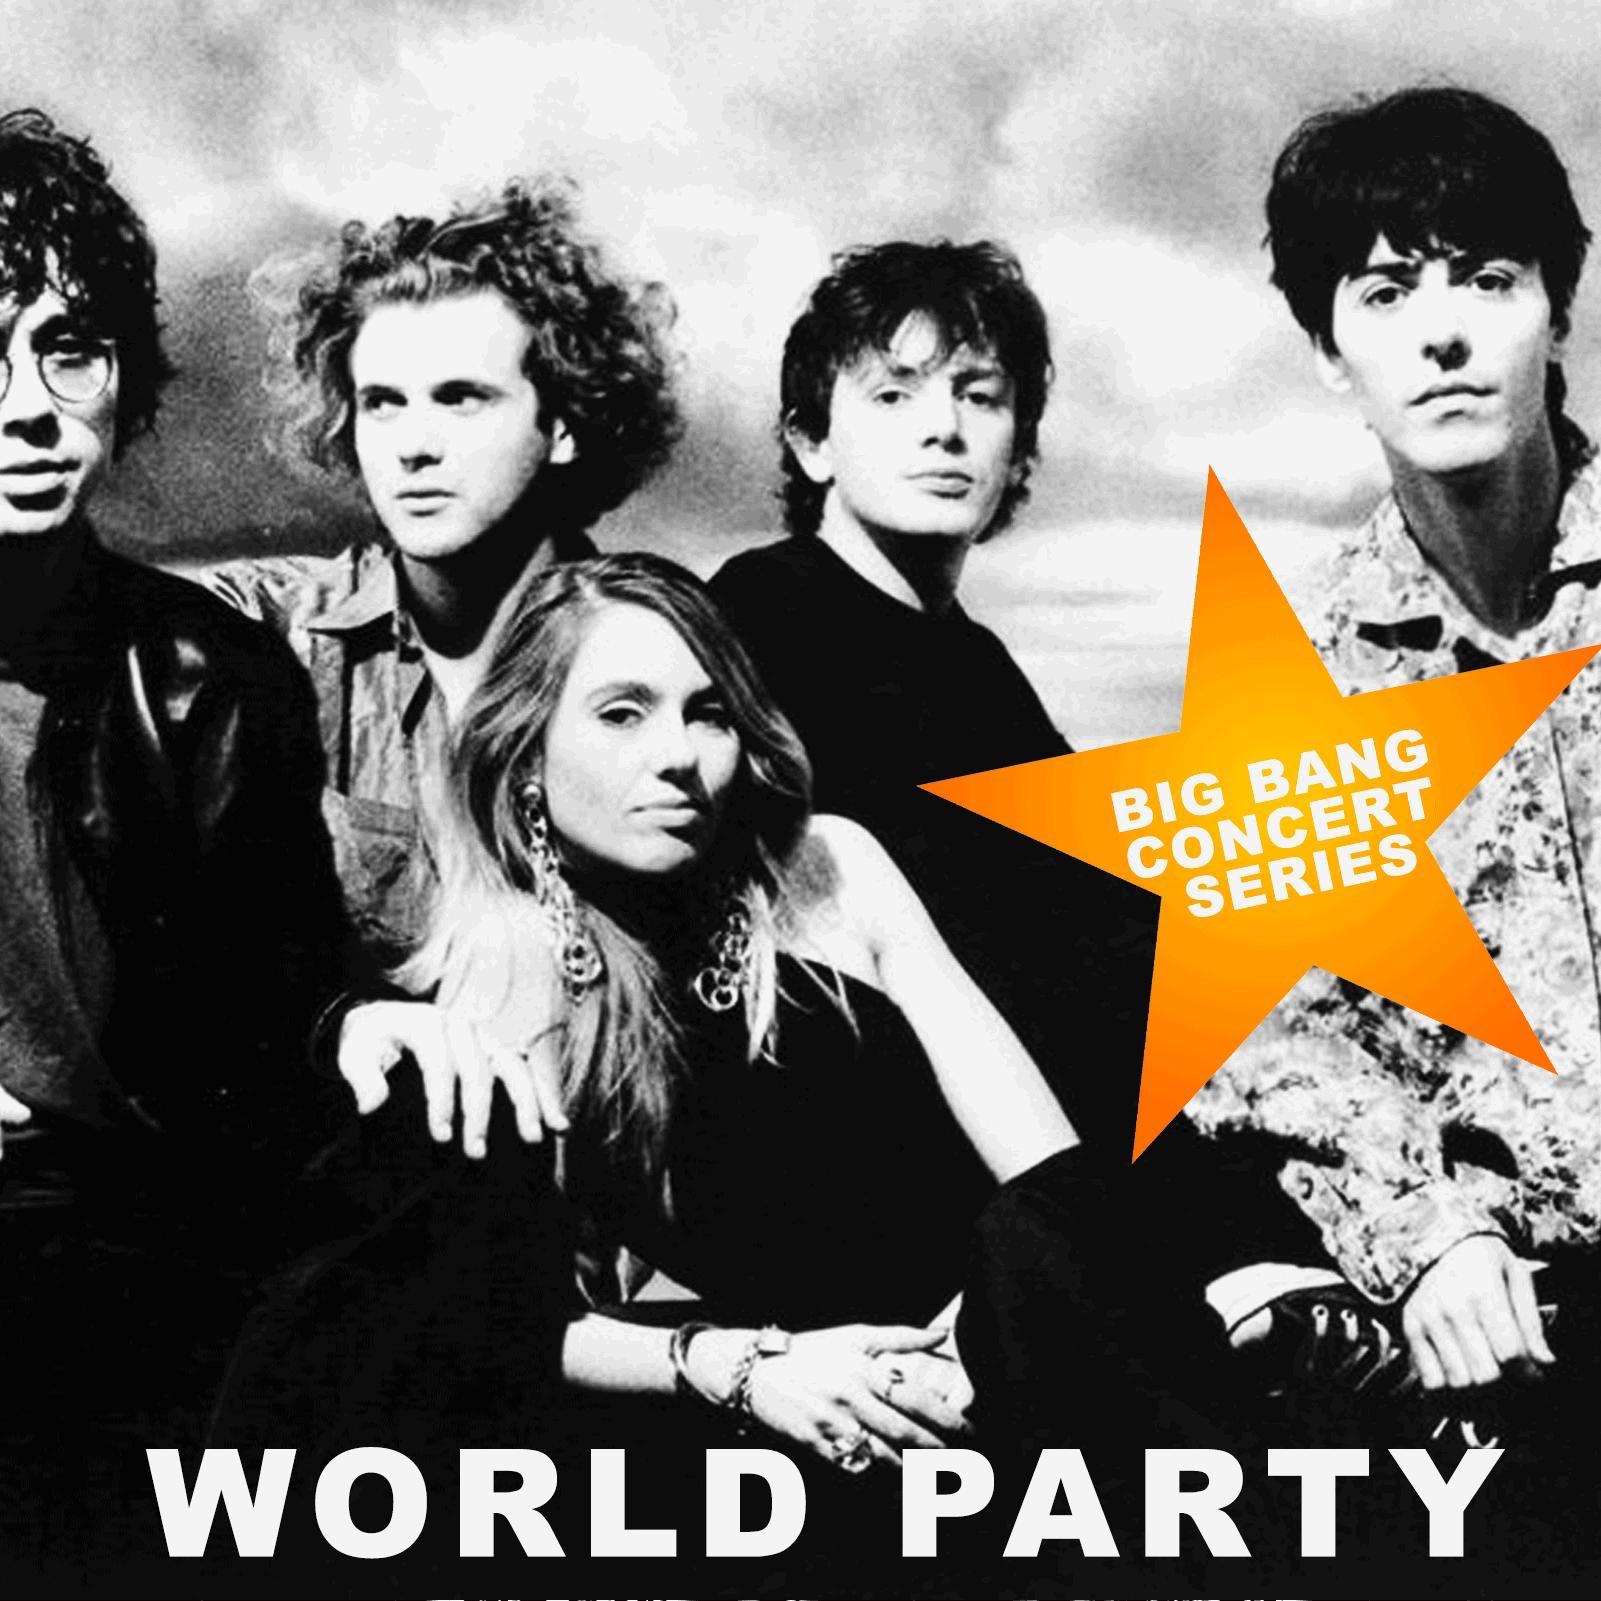 Big Bang Concert Series: World Party (Live) - EP